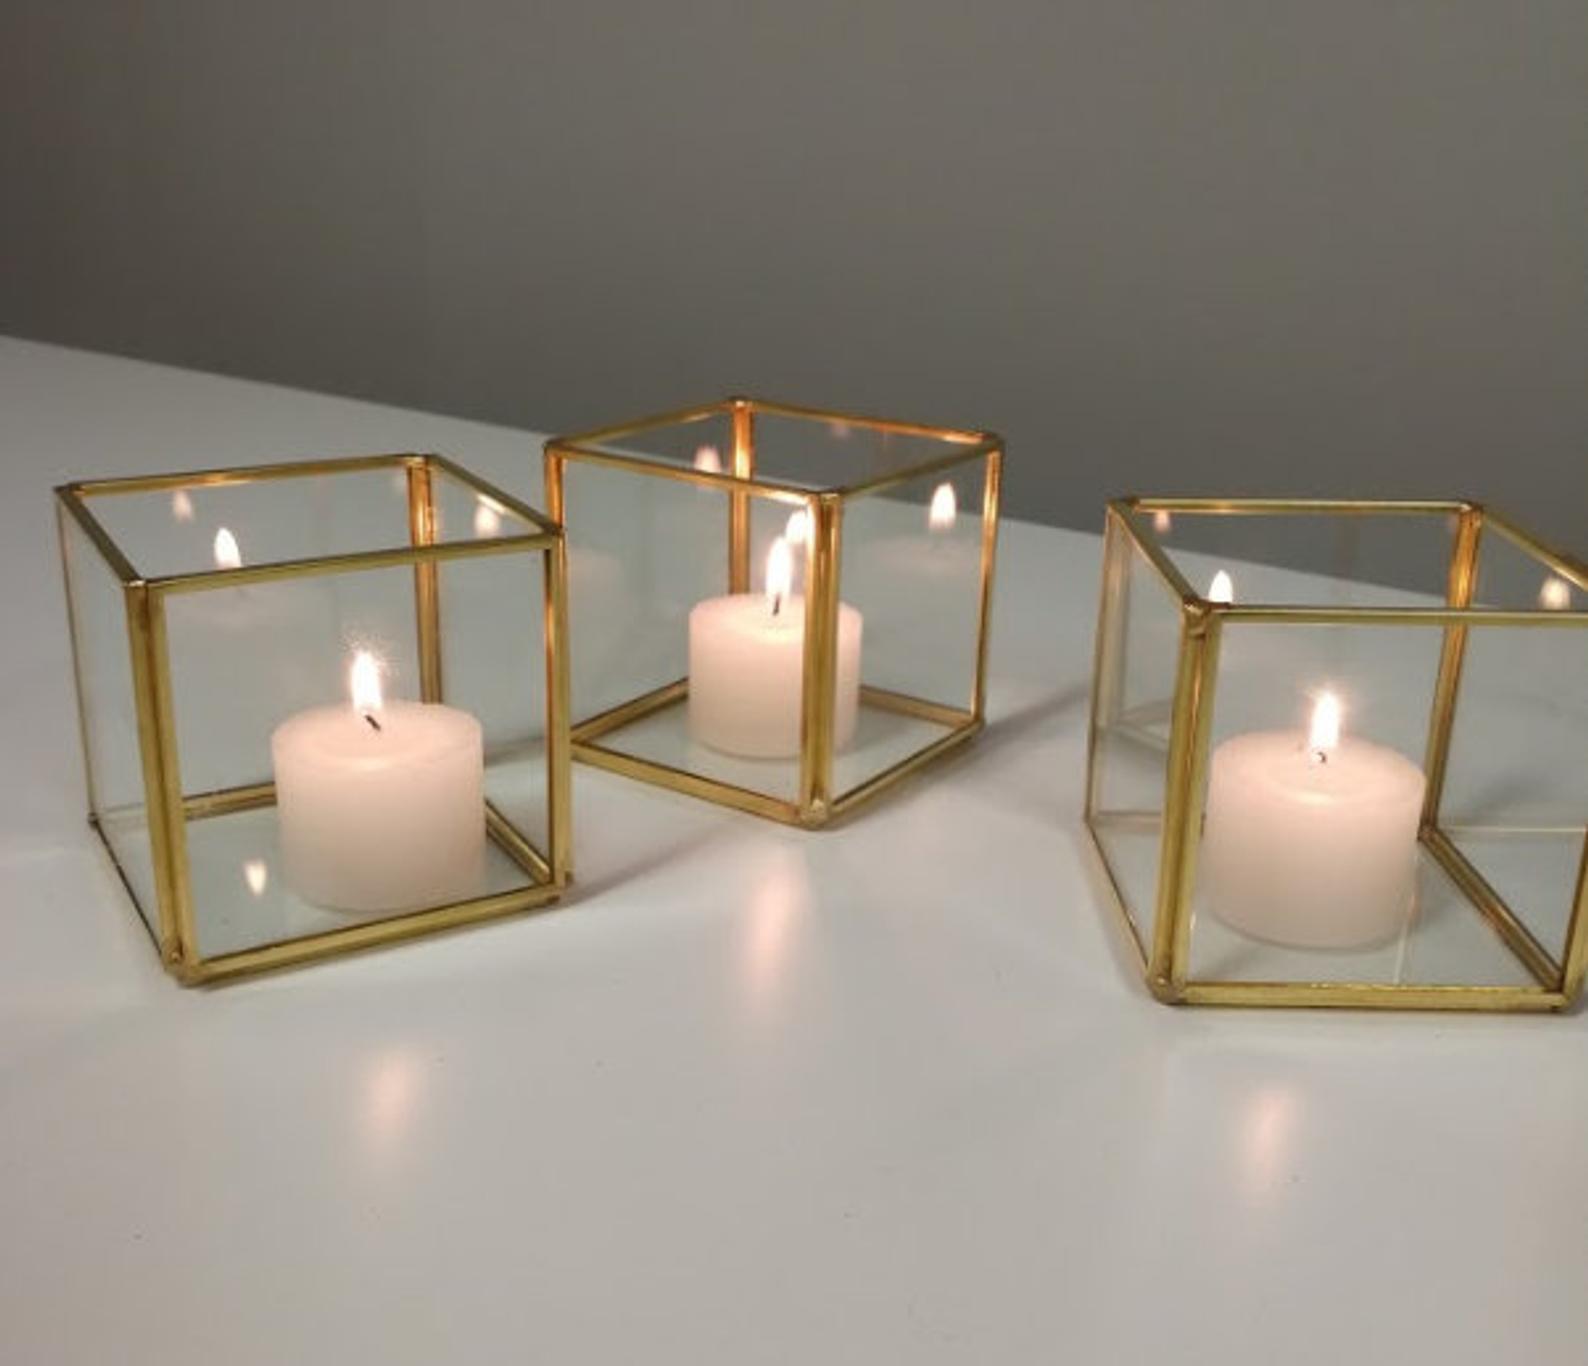 glass votive geometric terrarium for candles and succulents